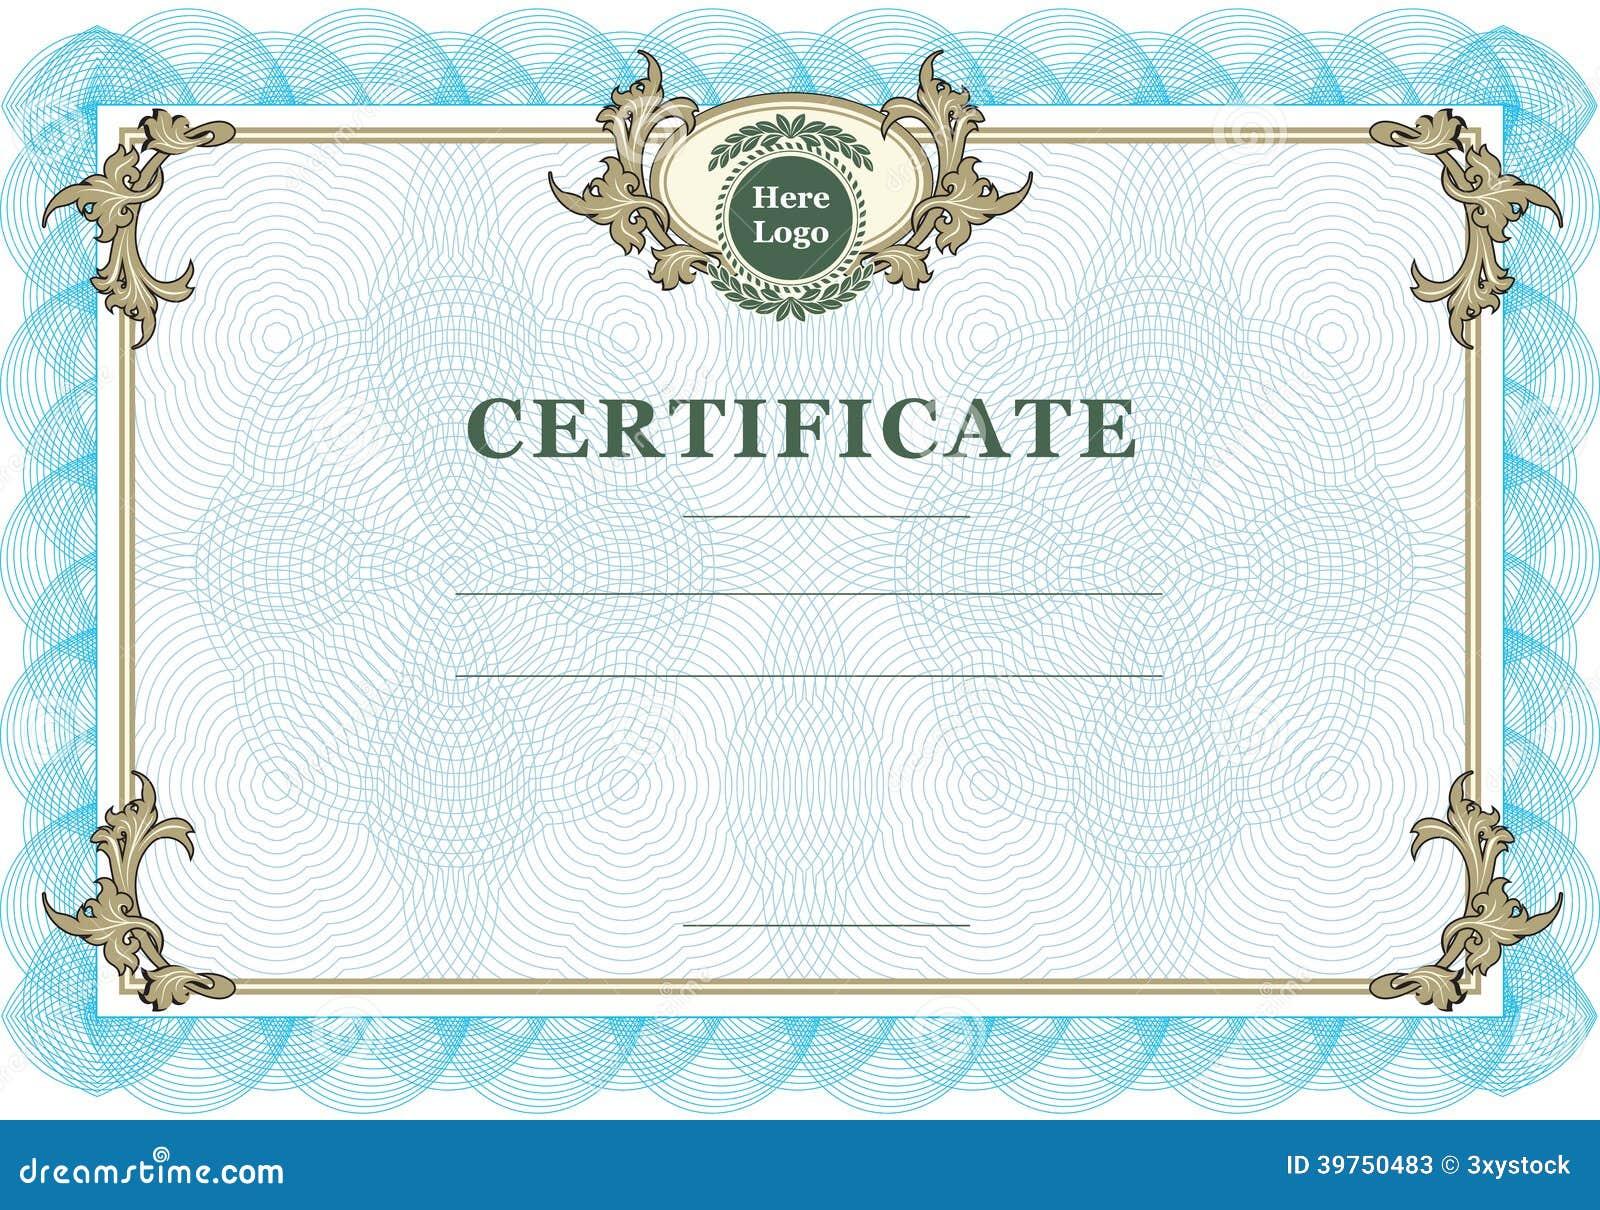 Vintage Certificate Stock Vector Image 39750483